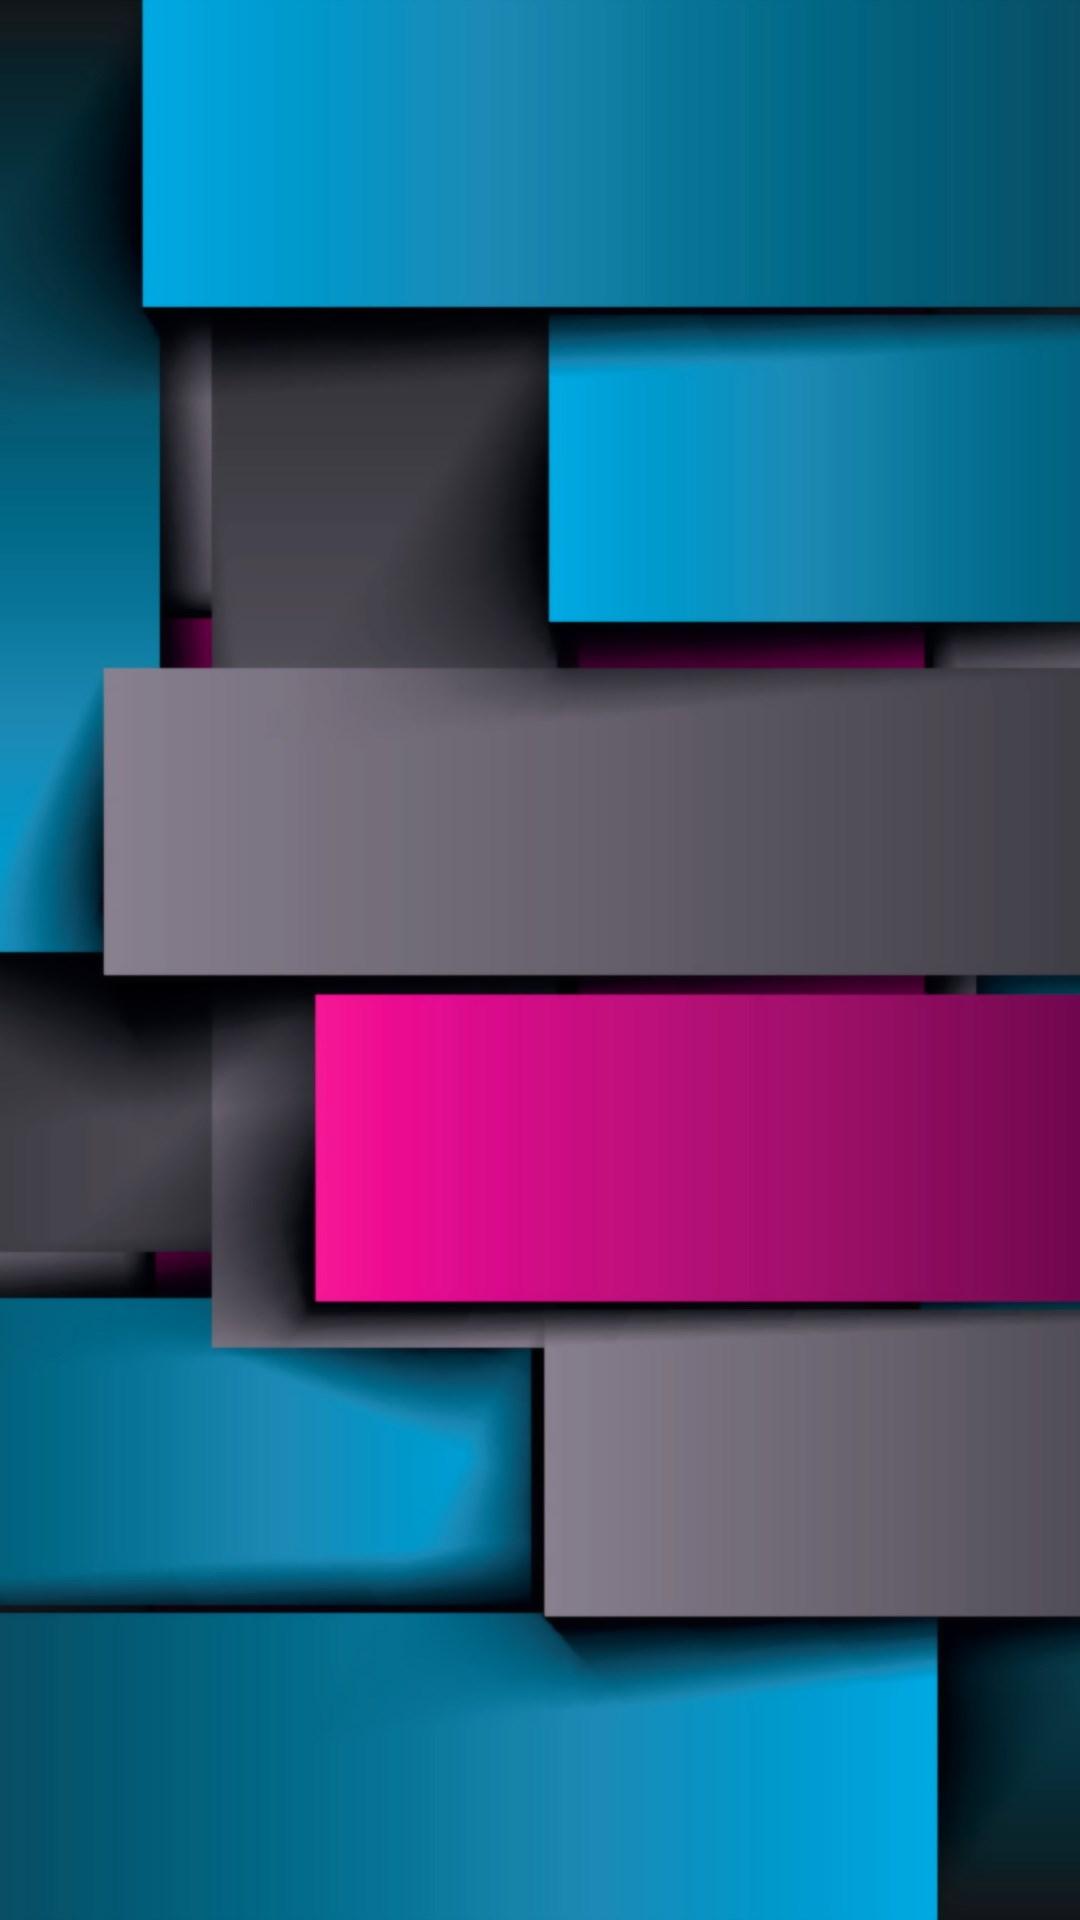 Best Anime Wallpapers Windows Phone Wallpapersafari